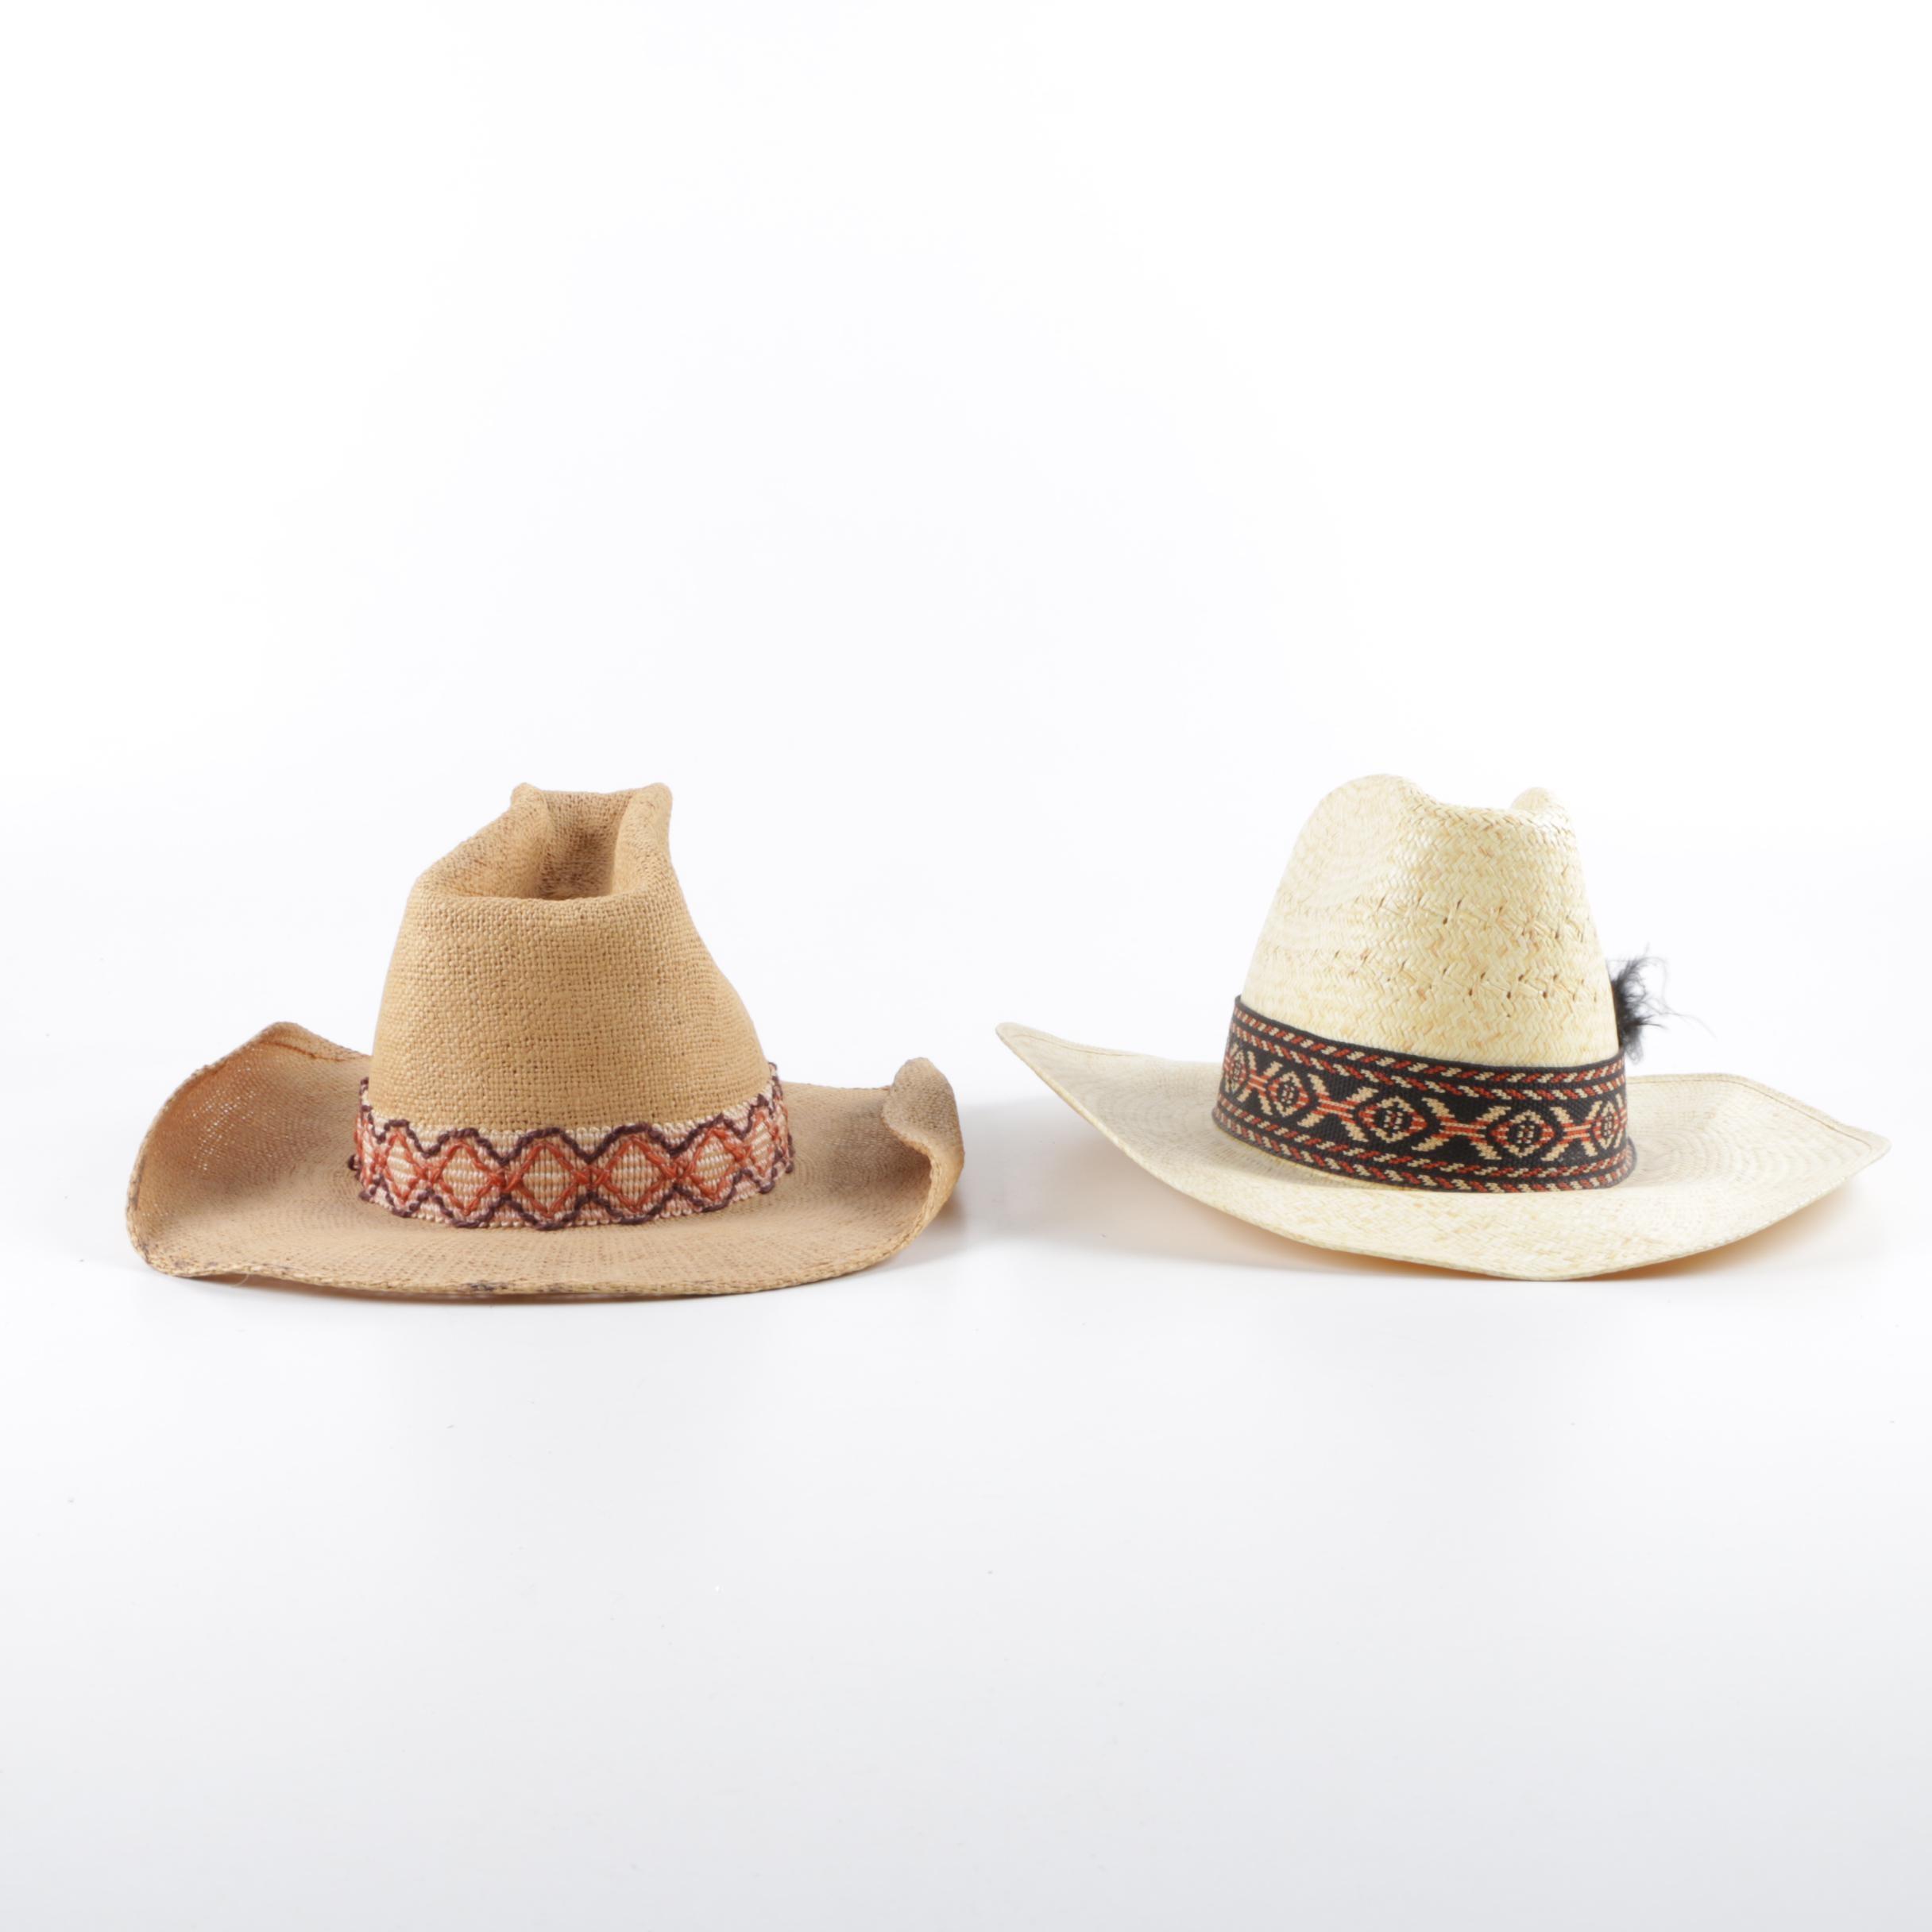 Vintage Resistol and Artel Straw Cowboy Hats